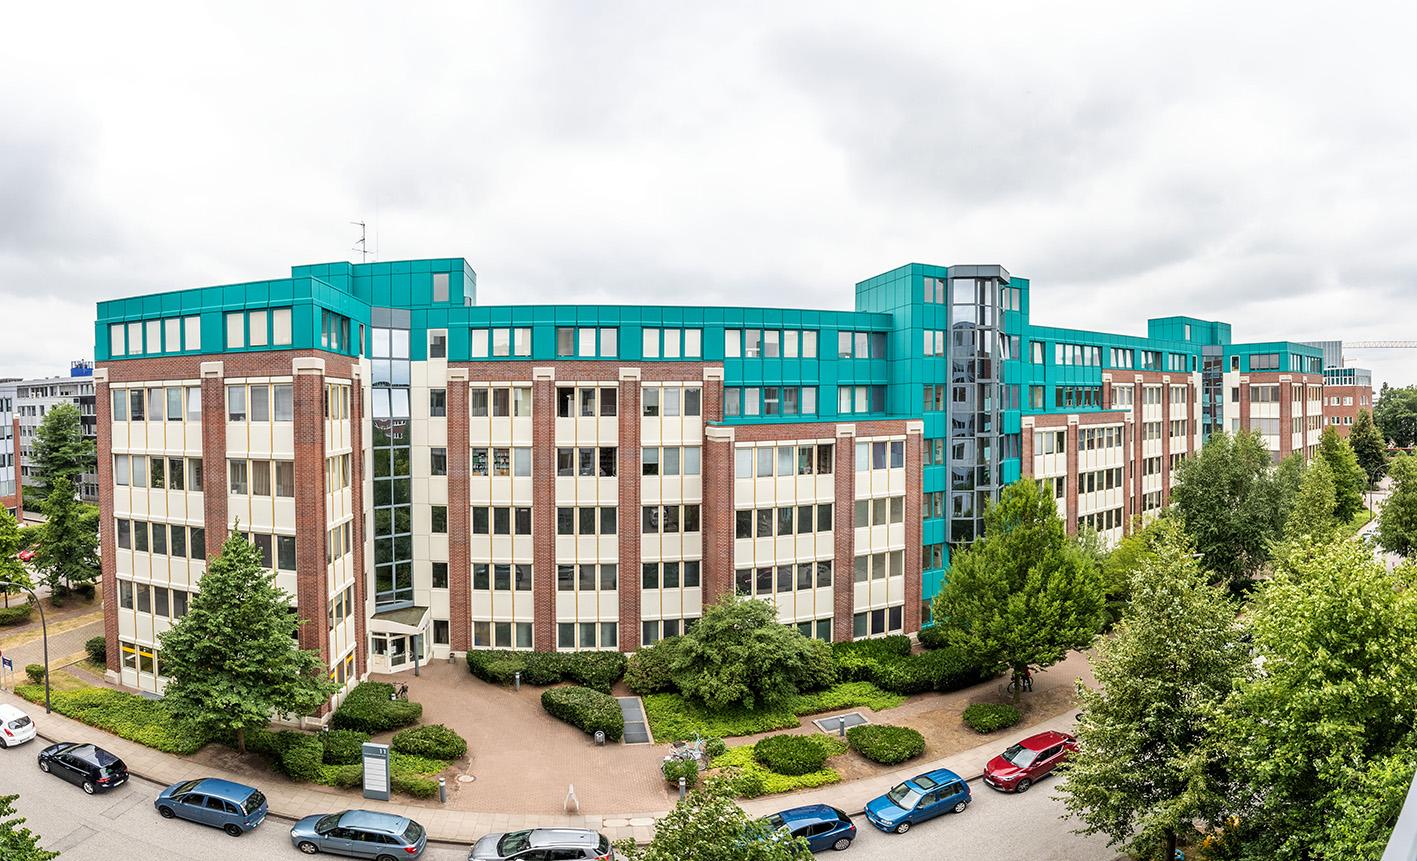 Universitaetsmedizin-Neumarkt-am-Main– Campus-Hamburg